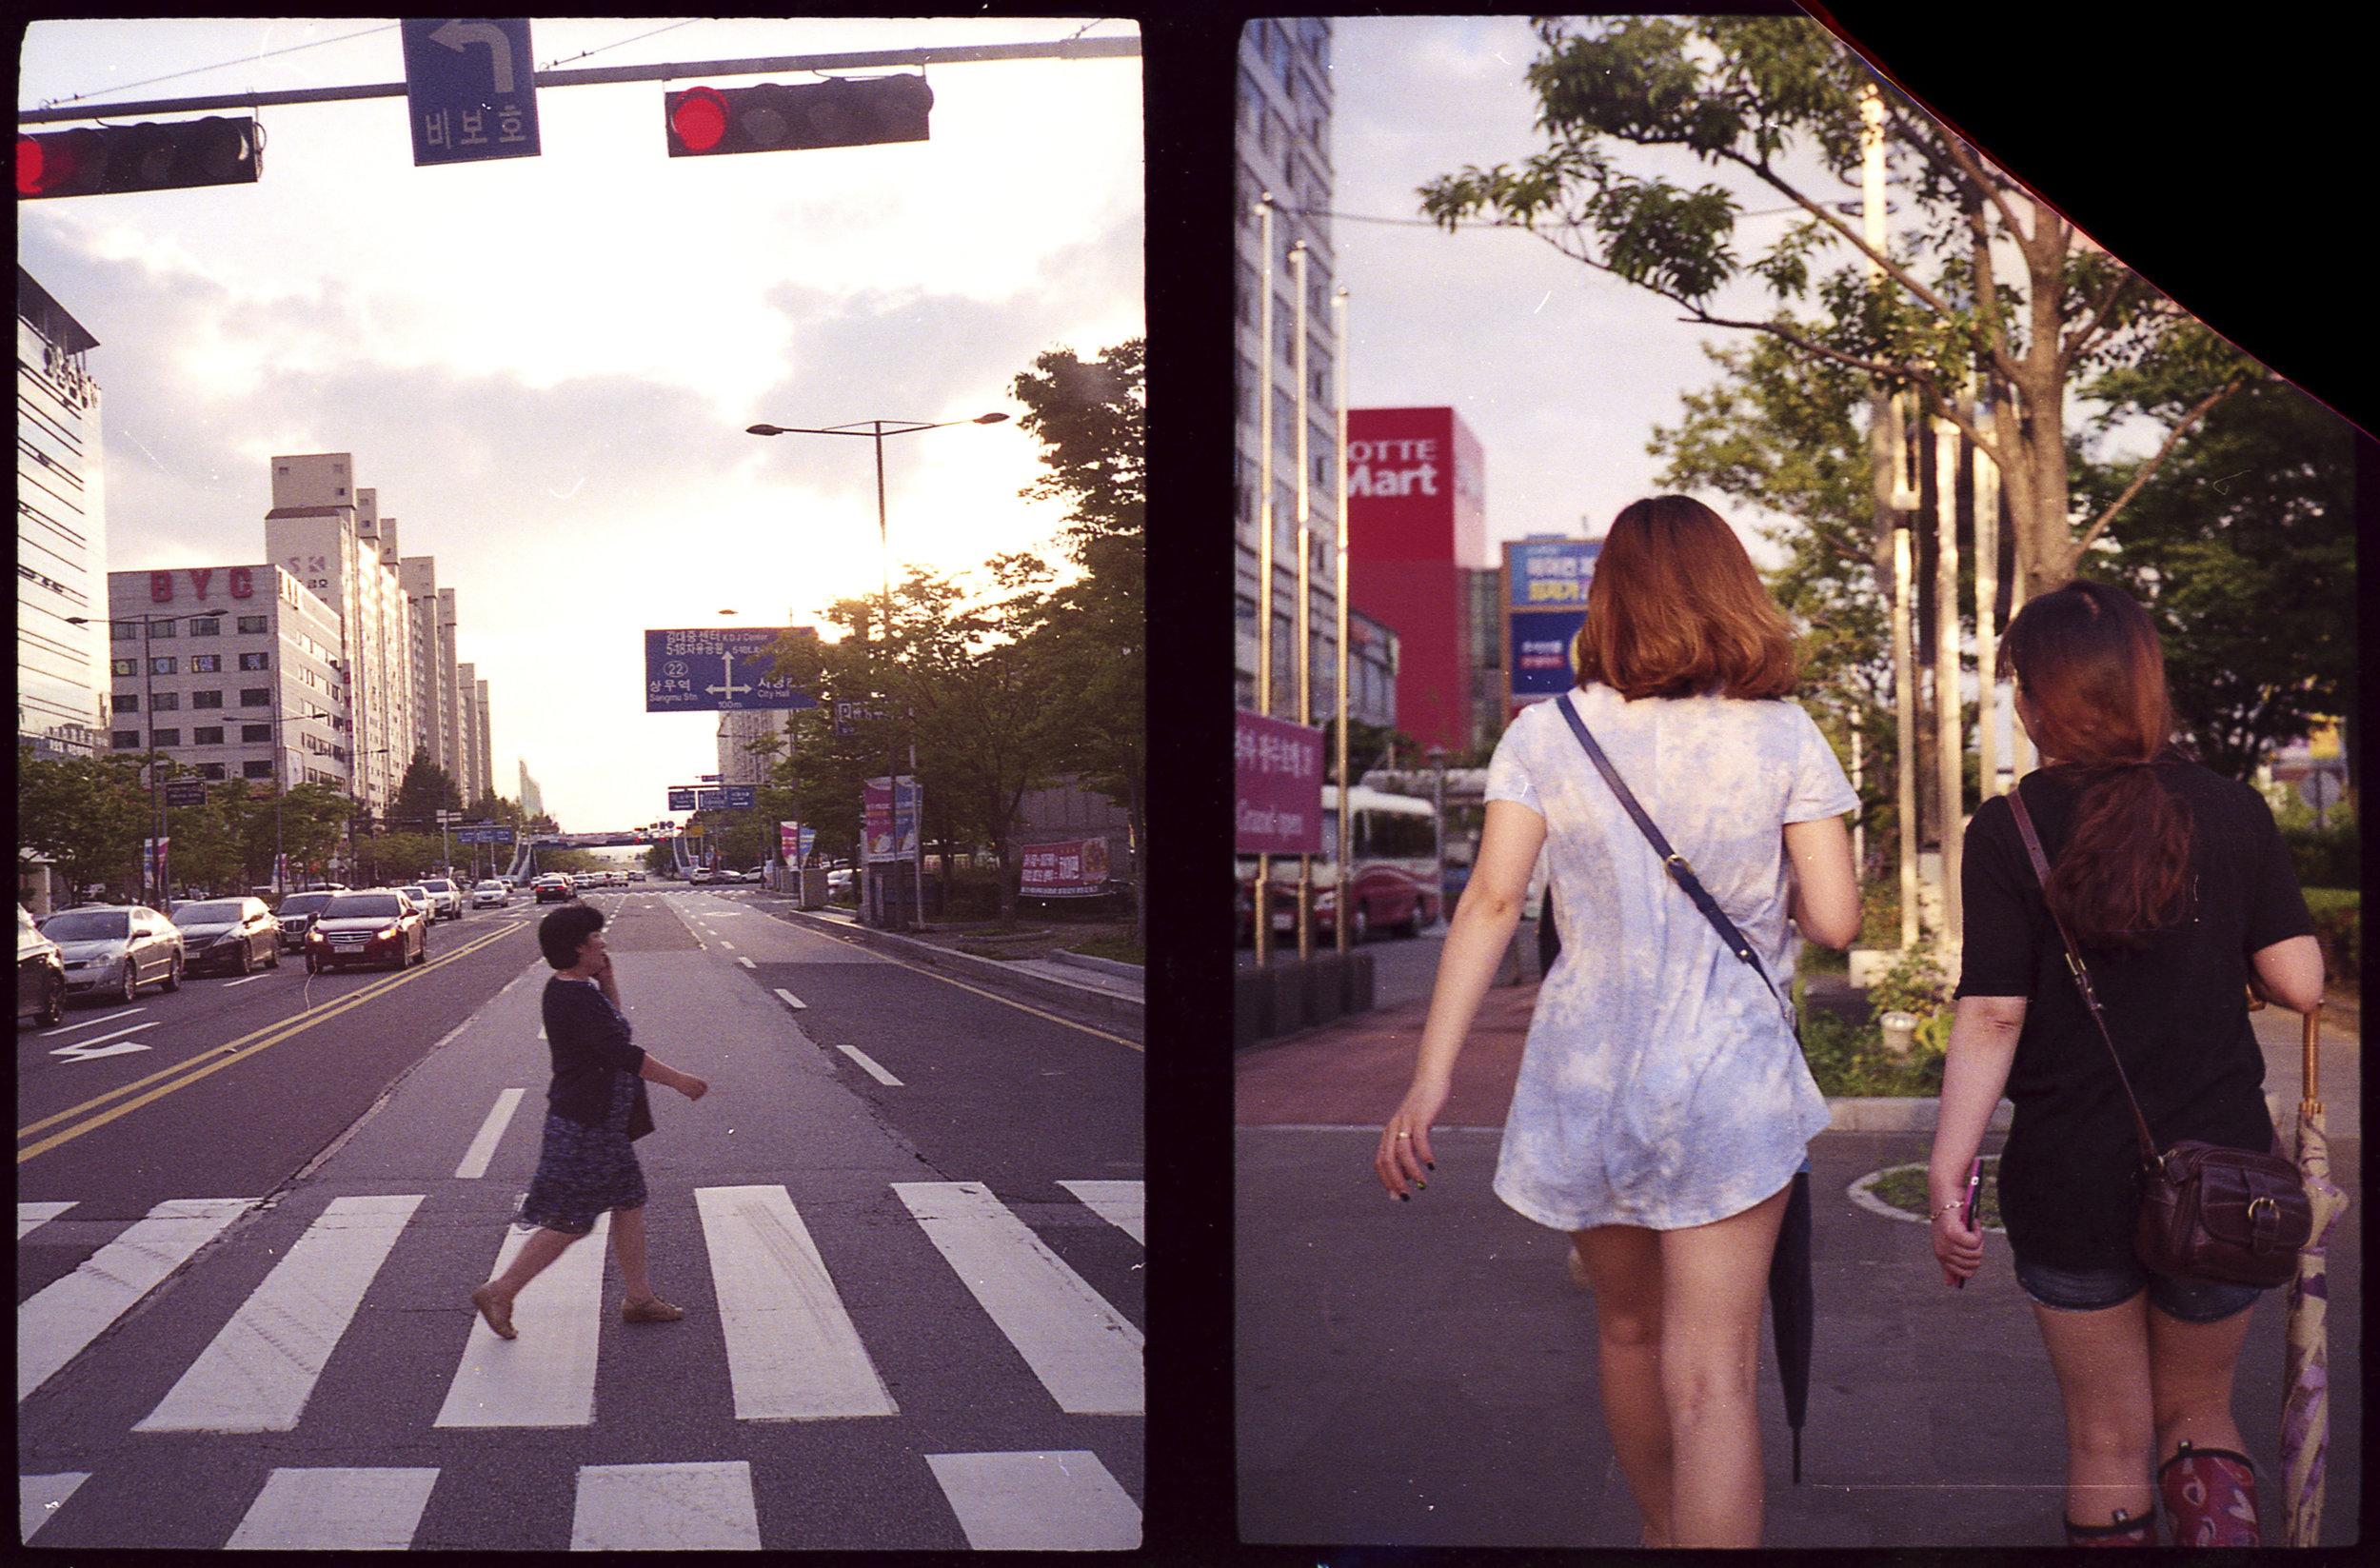 Walking to Lotte Mart